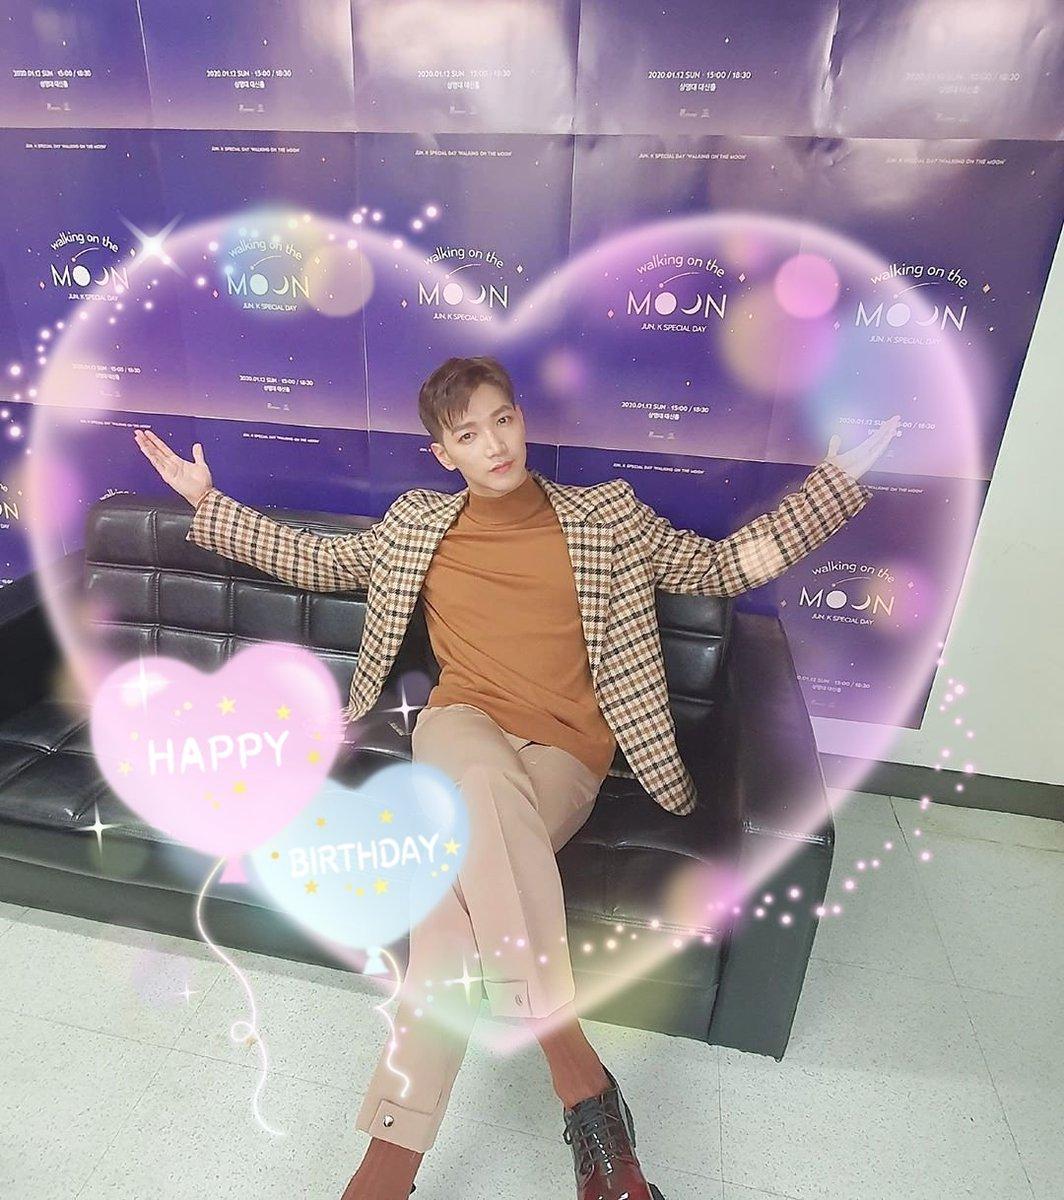 RT @327mm: I wish you a happy birthday! #LoveOnJunkayDay https://t.co/u8AvHmF5ew